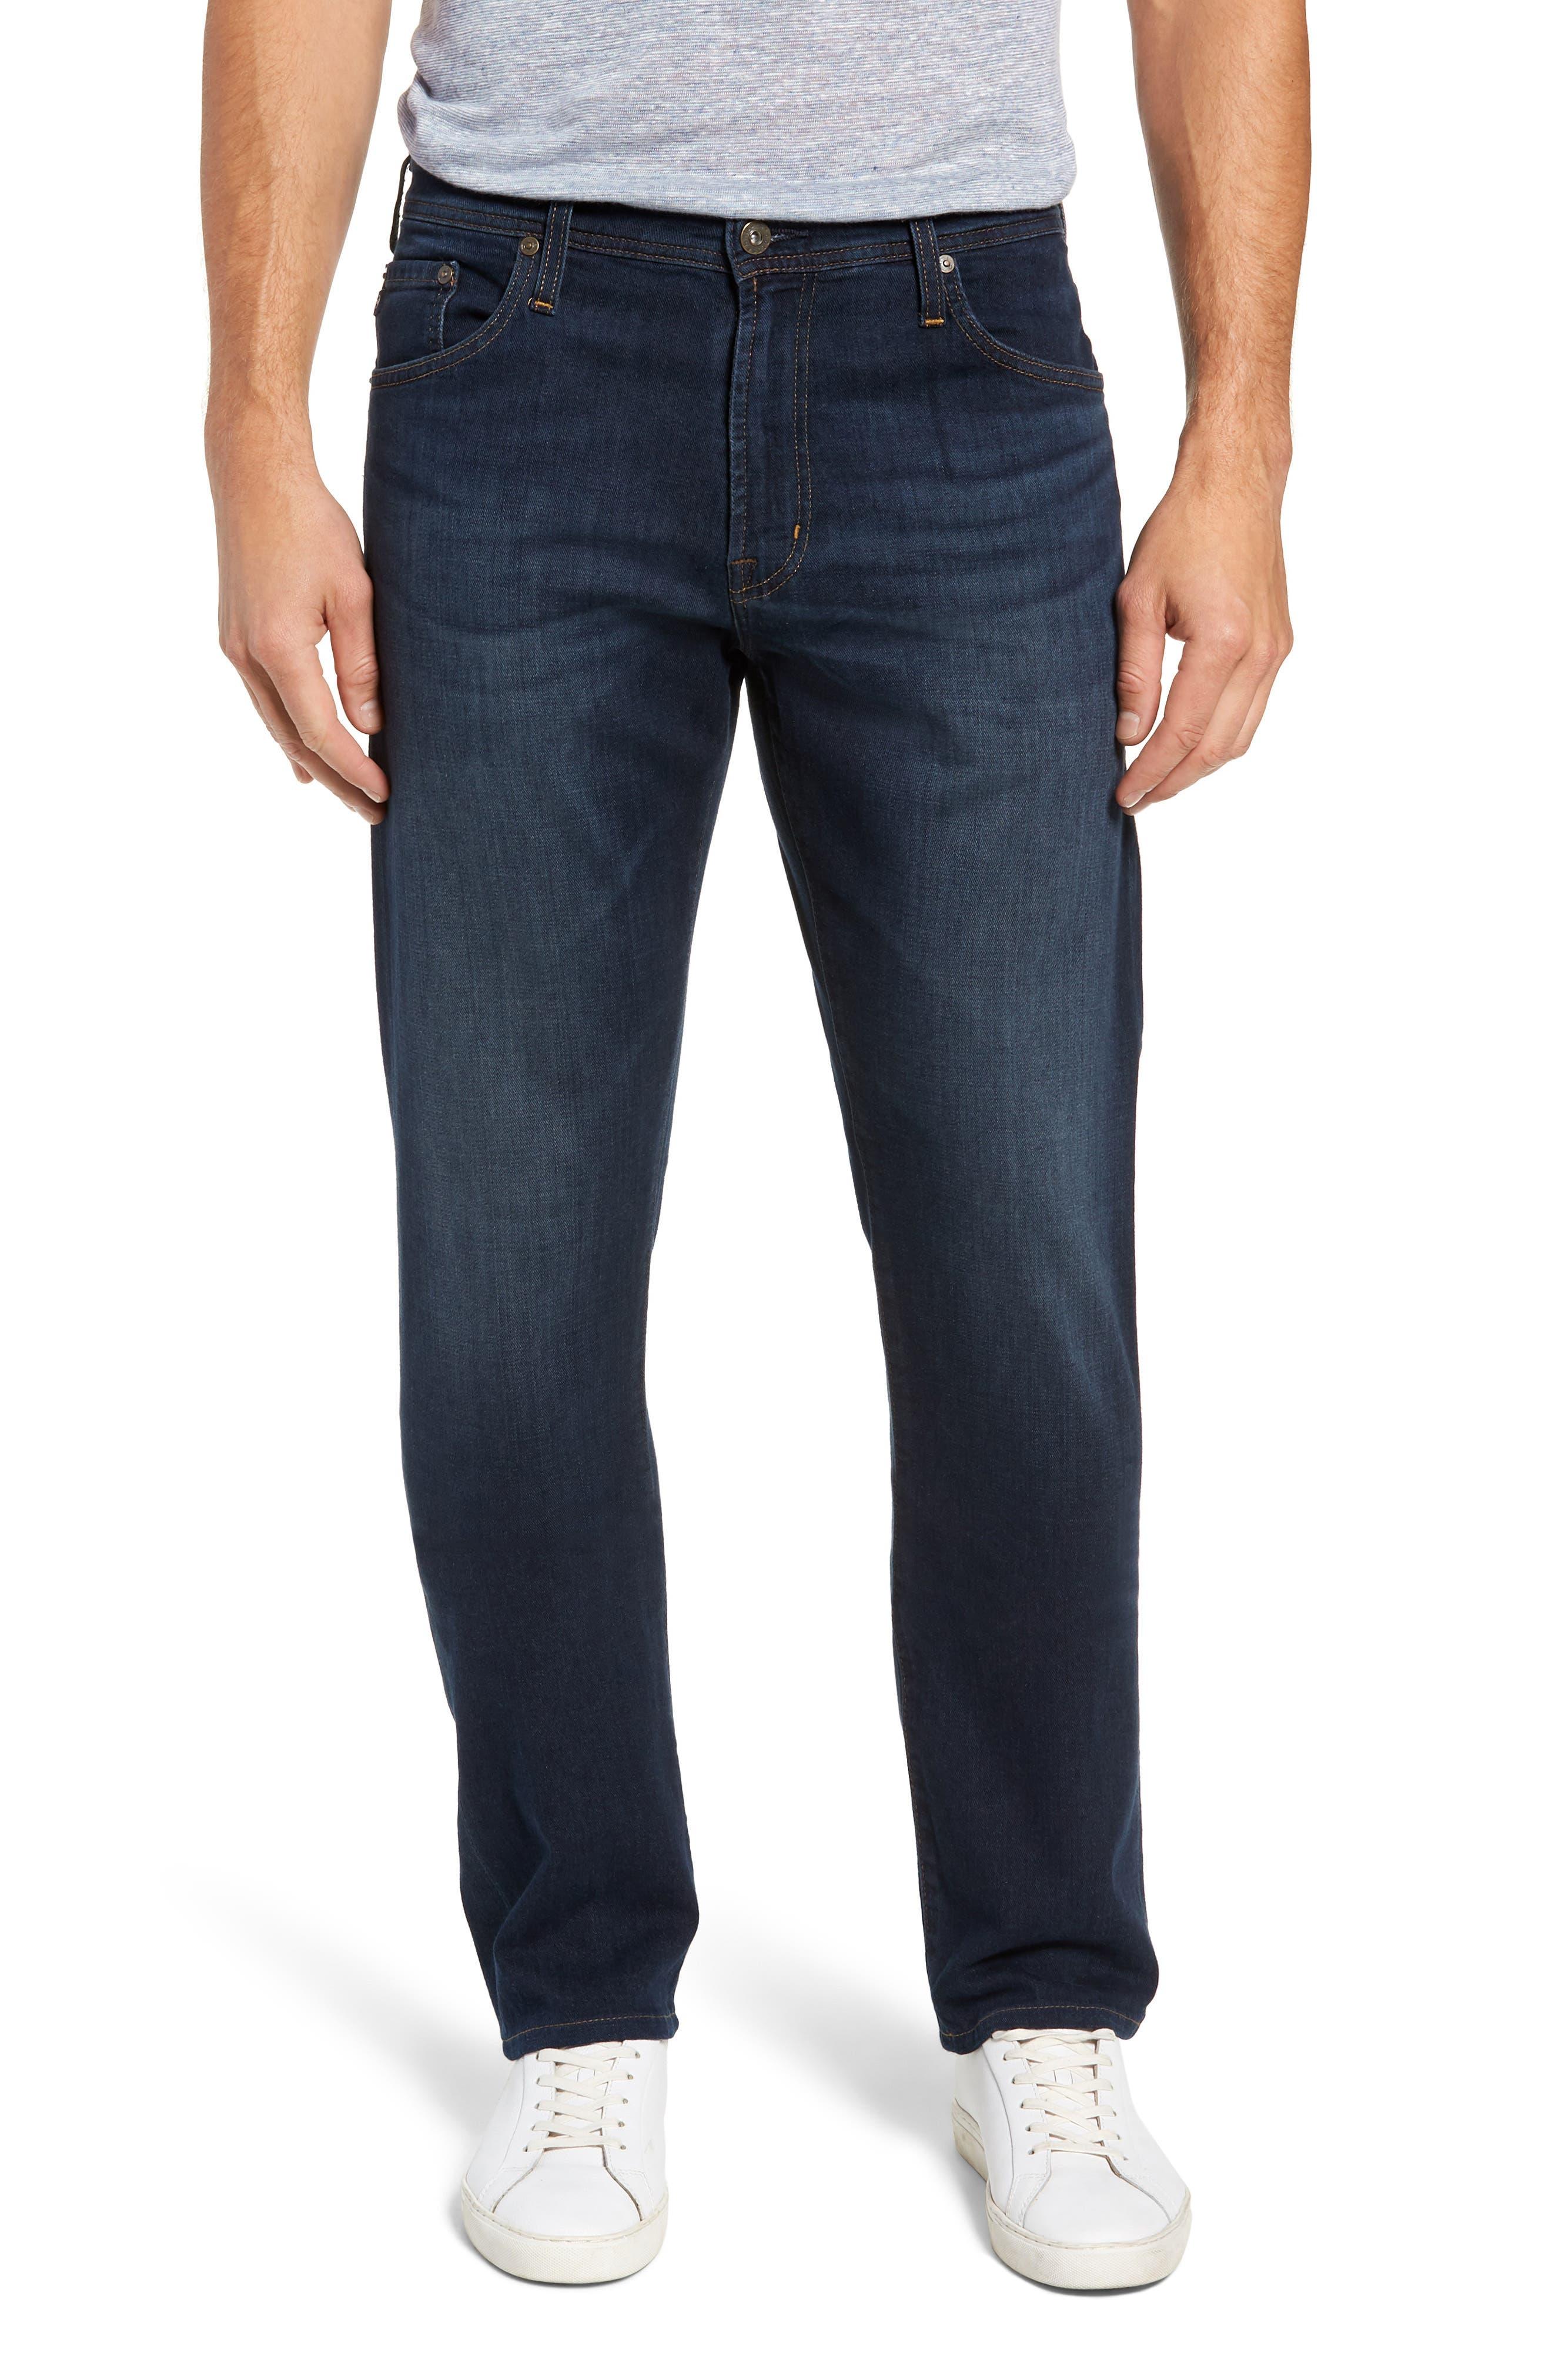 Ives Straight Leg Jeans,                             Main thumbnail 1, color,                             COVET